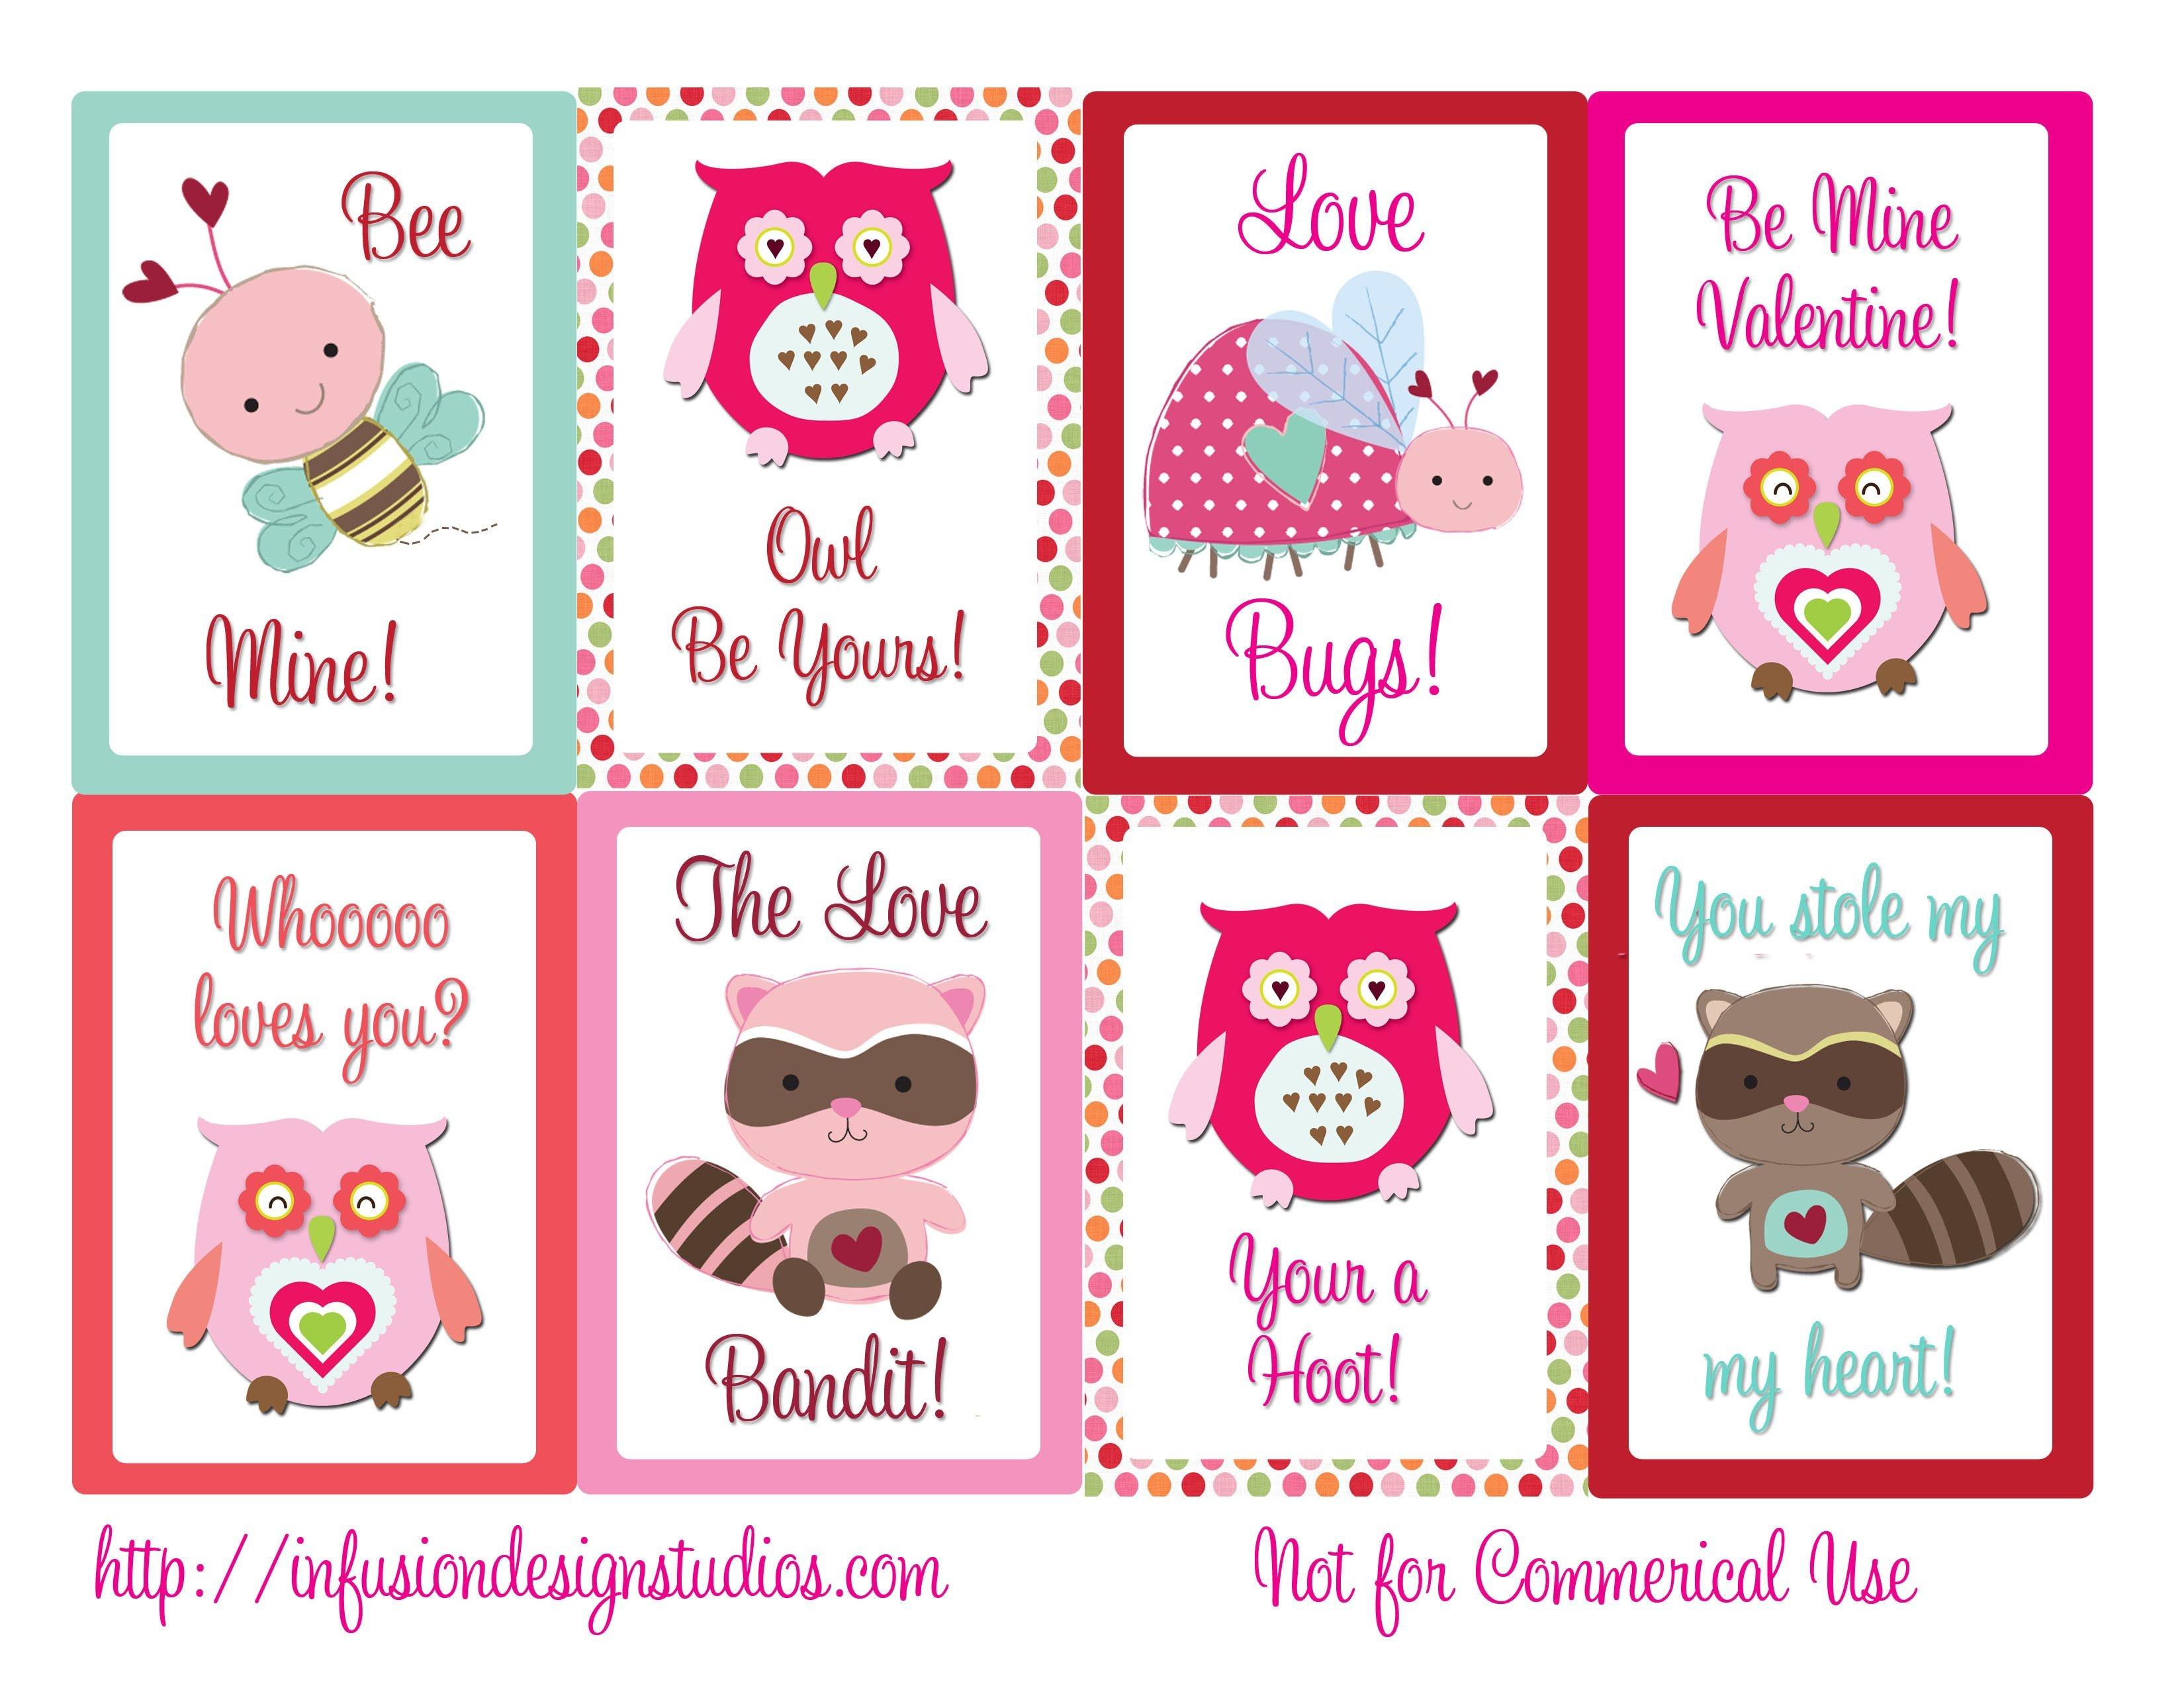 Free Printable Valentines Cards Children. If You Want These - Free Printable Valentine Cards For Kids